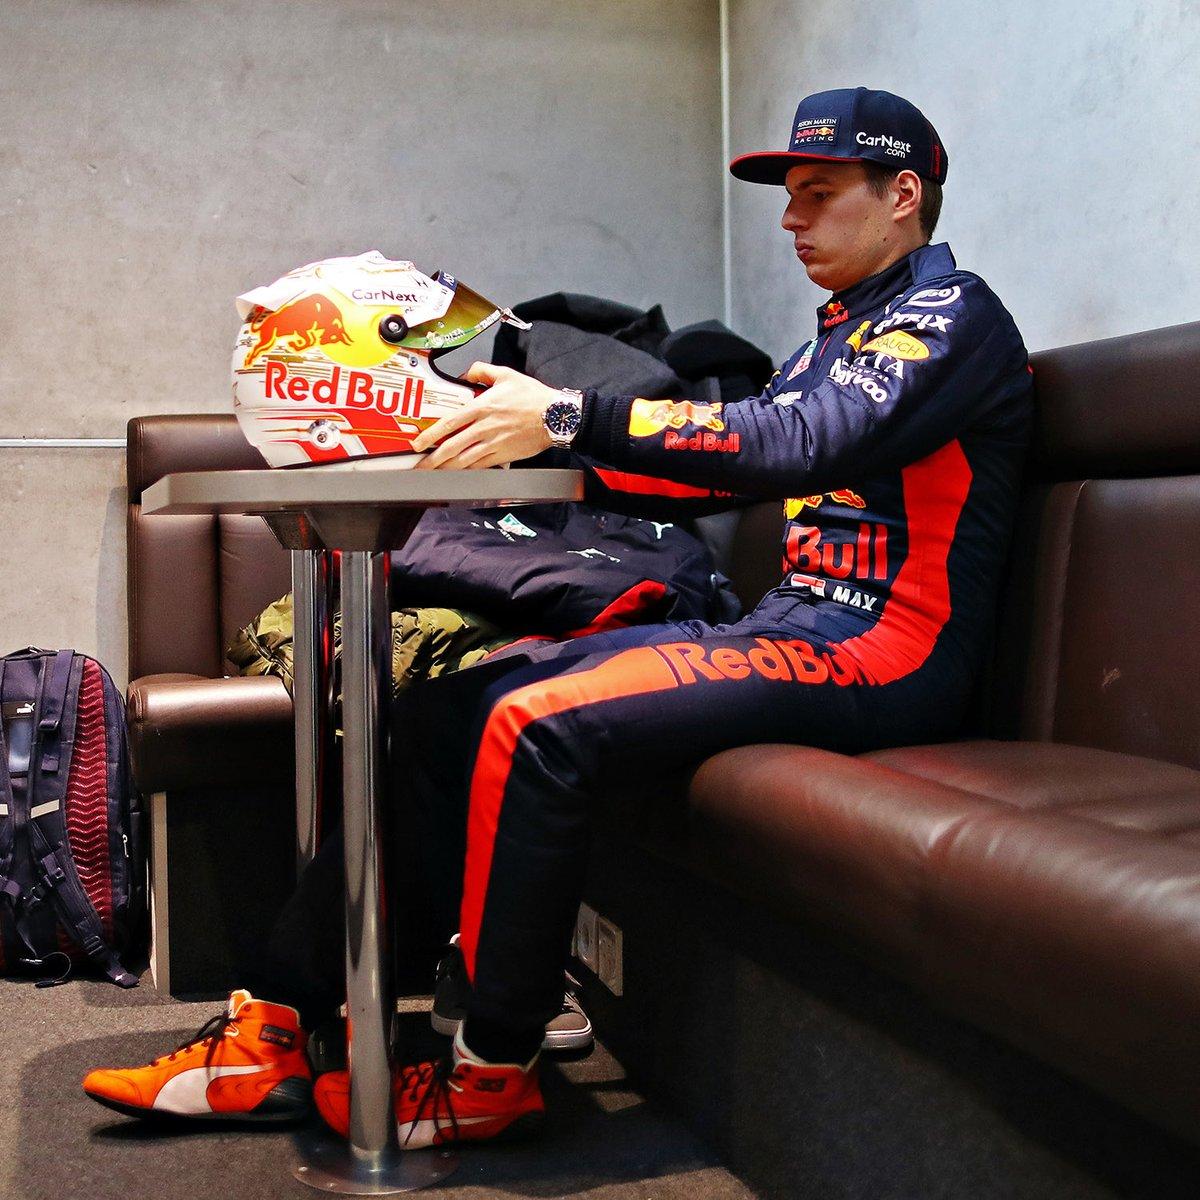 👌🏻😃  #MaxVerstappen #F1 #RB16 #RedBull #MightyMax